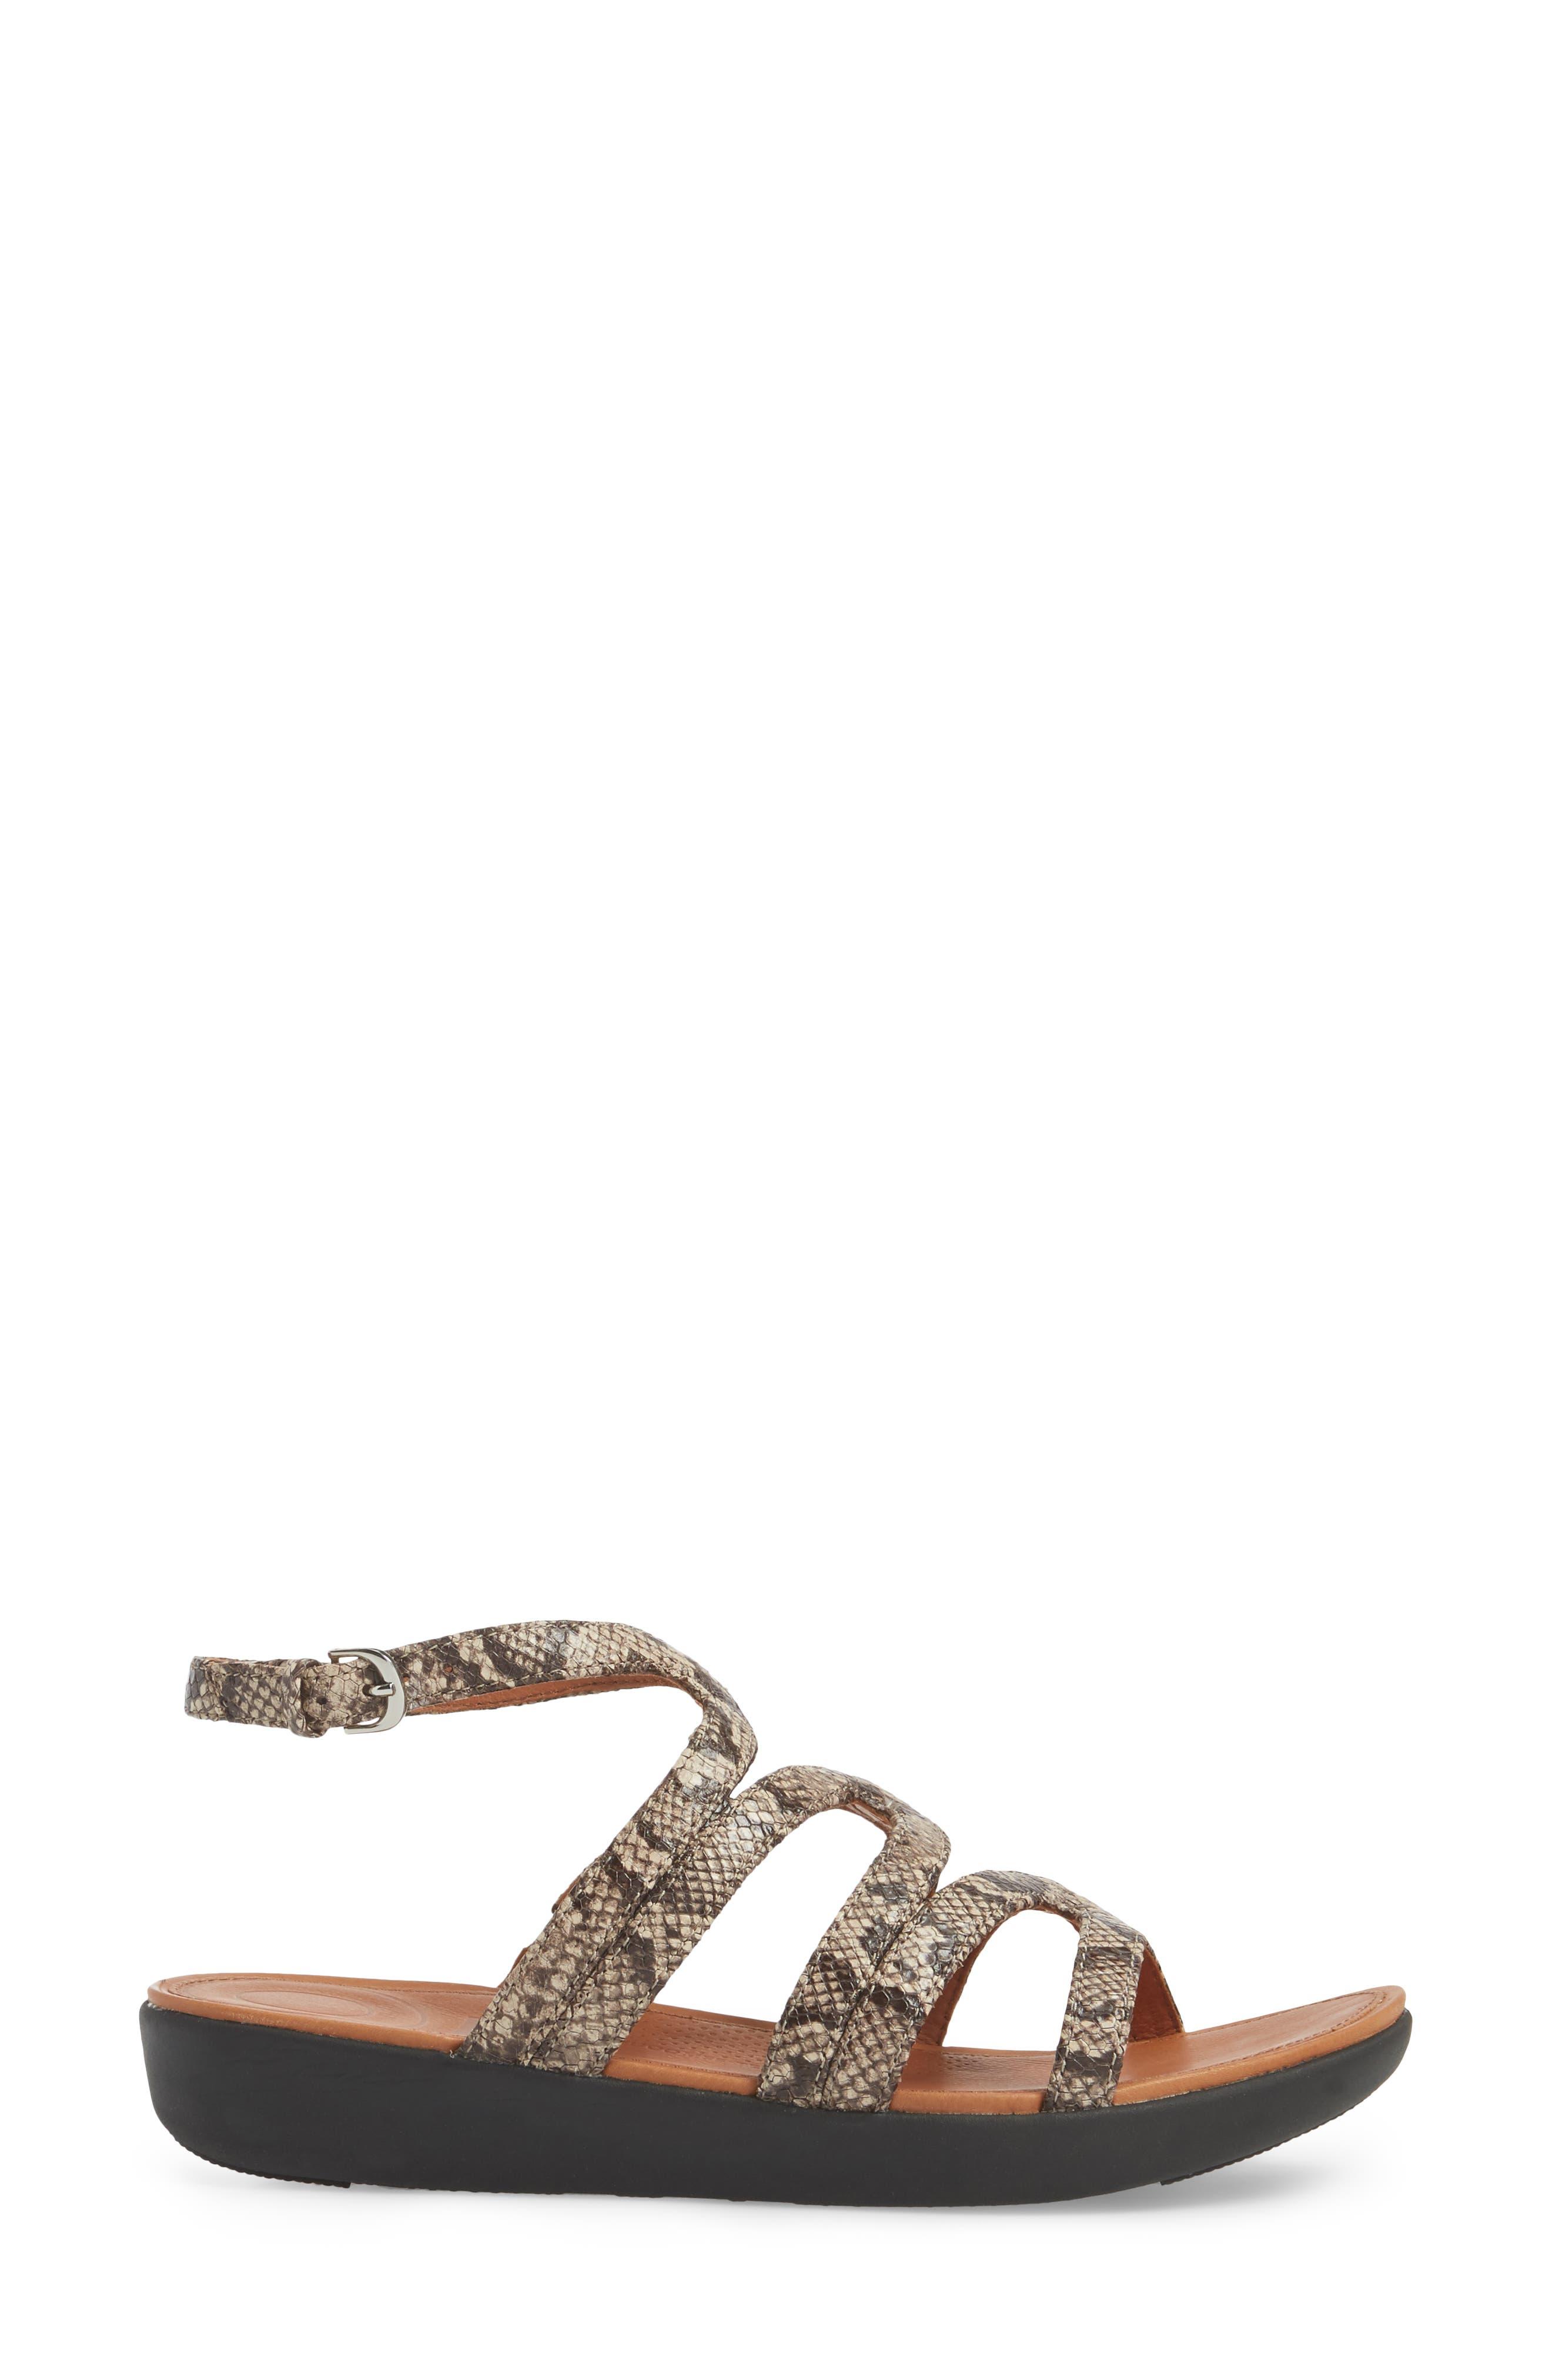 Strata Gladiator Sandal,                             Alternate thumbnail 3, color,                             Taupe Snake Print Leather